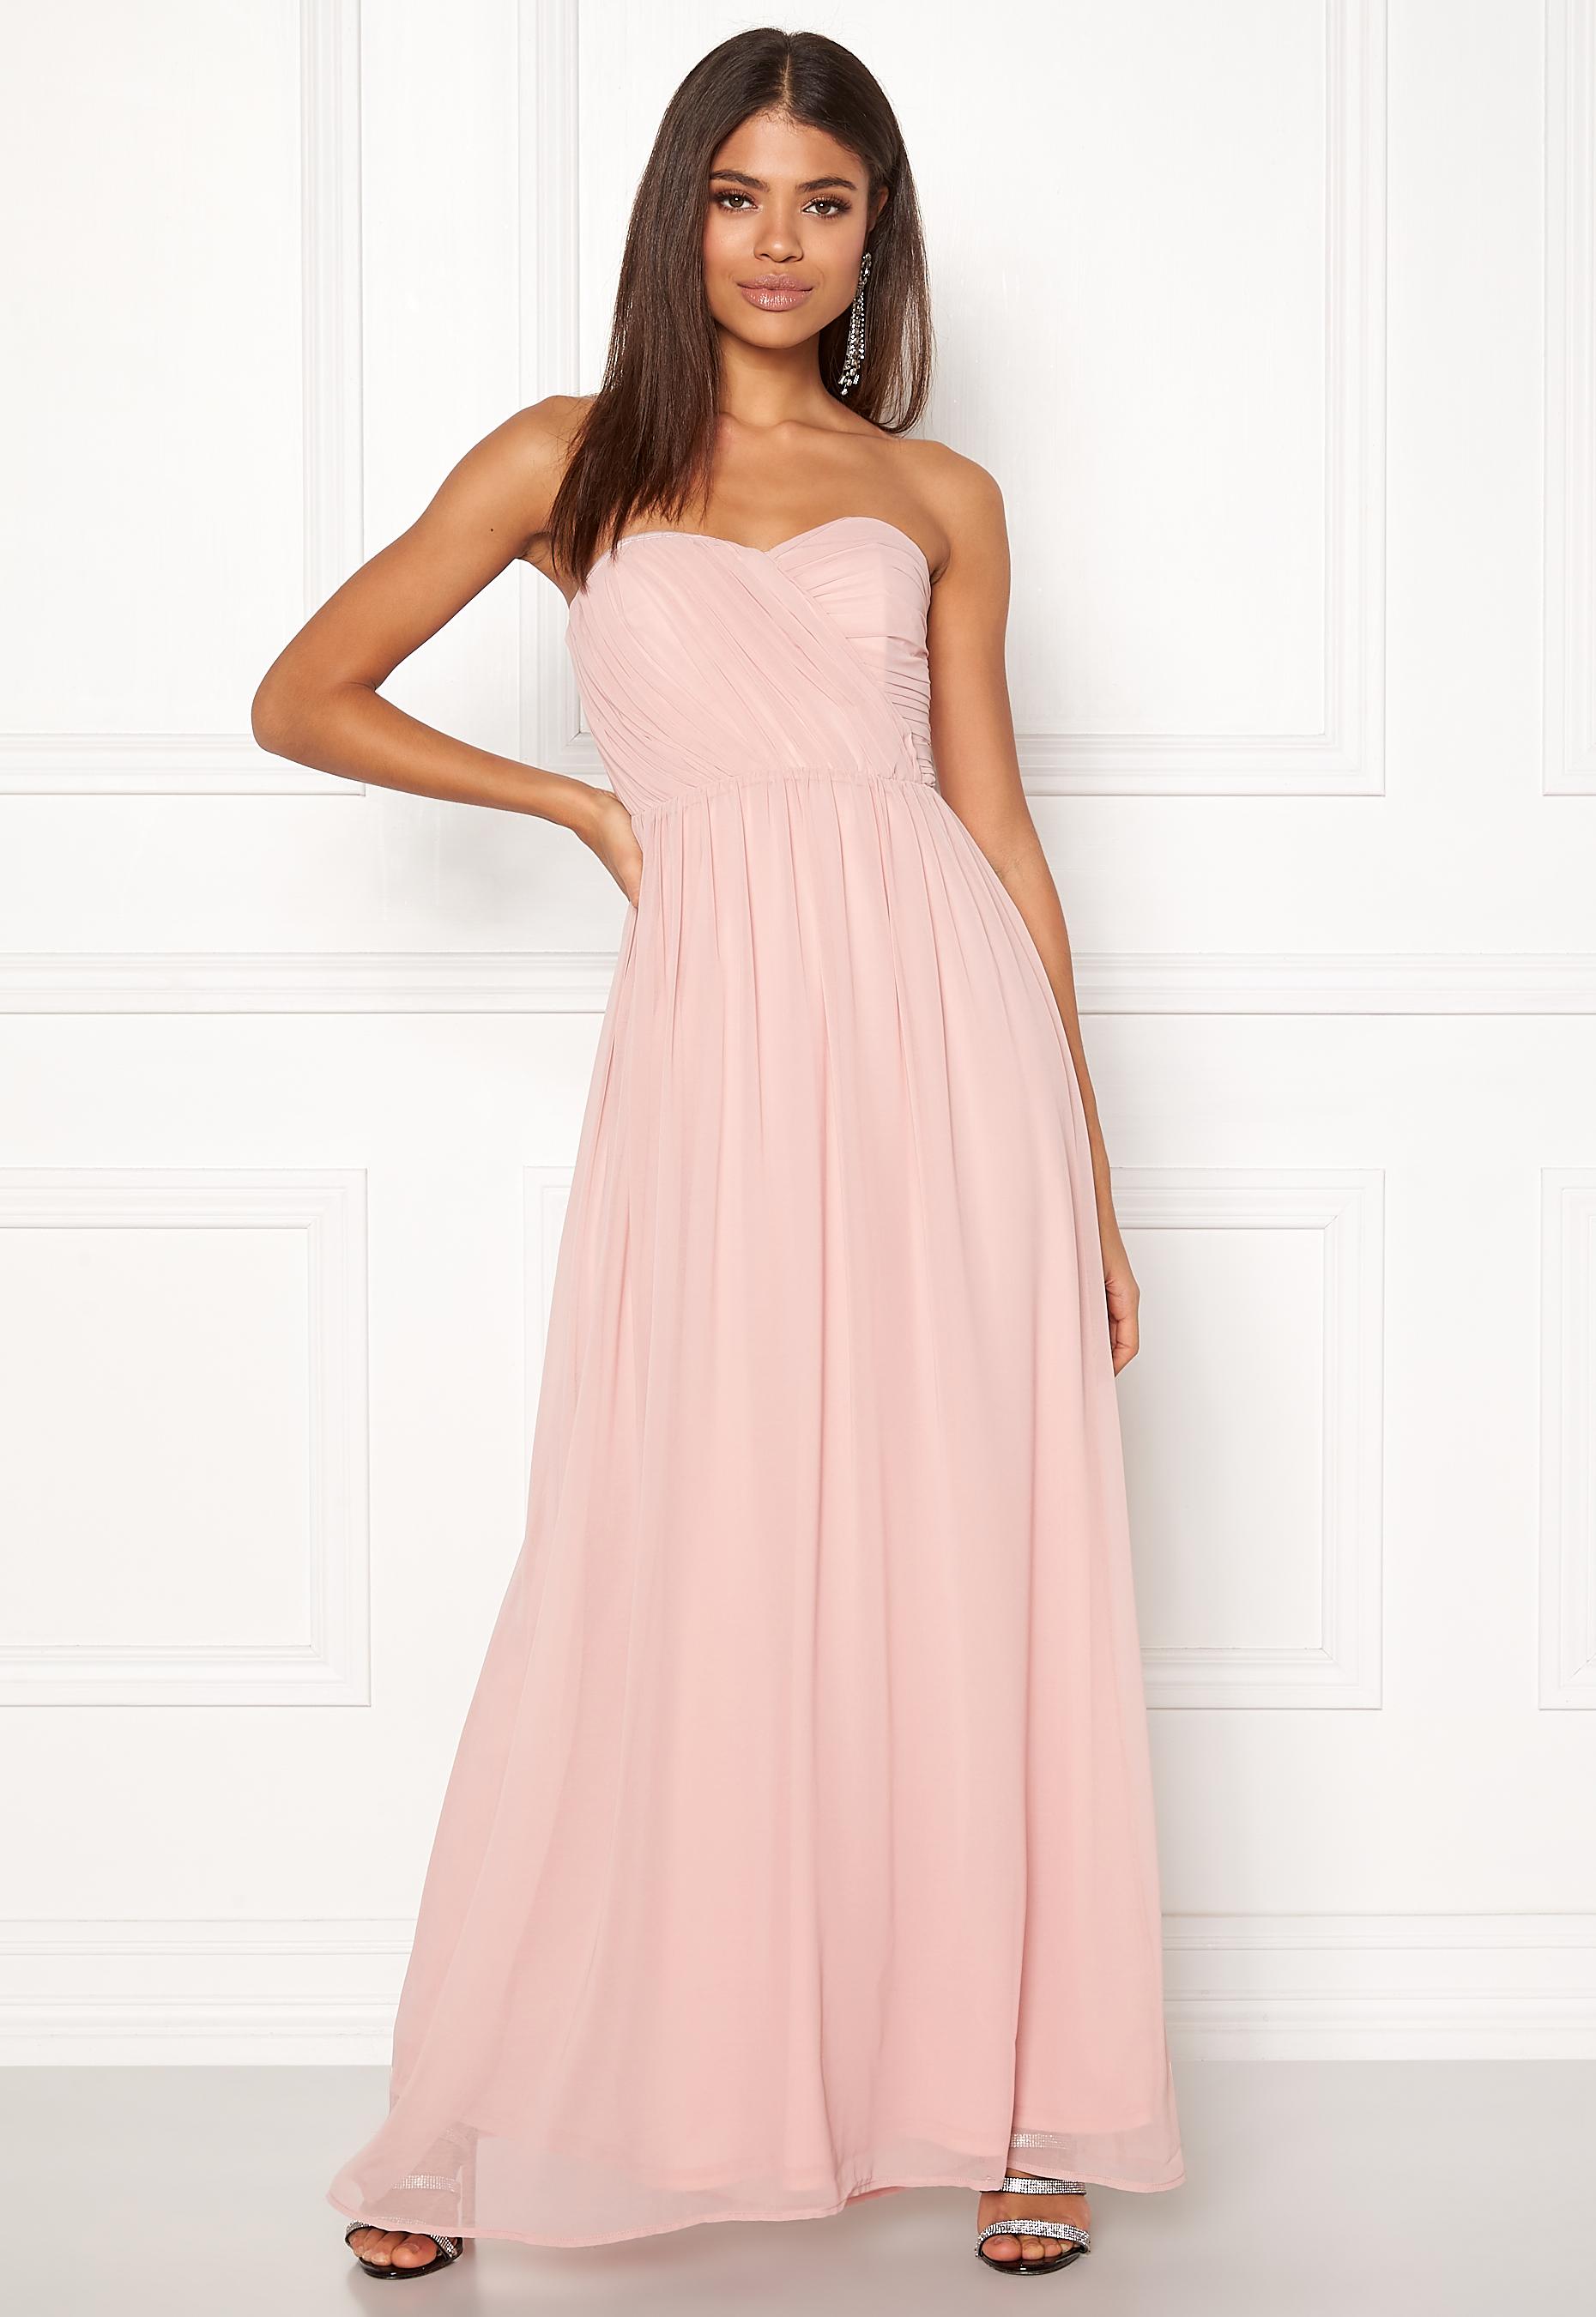 New Look Pink Floral Choker Neck Summer Skater Dress Wedding Party Evening 6-18